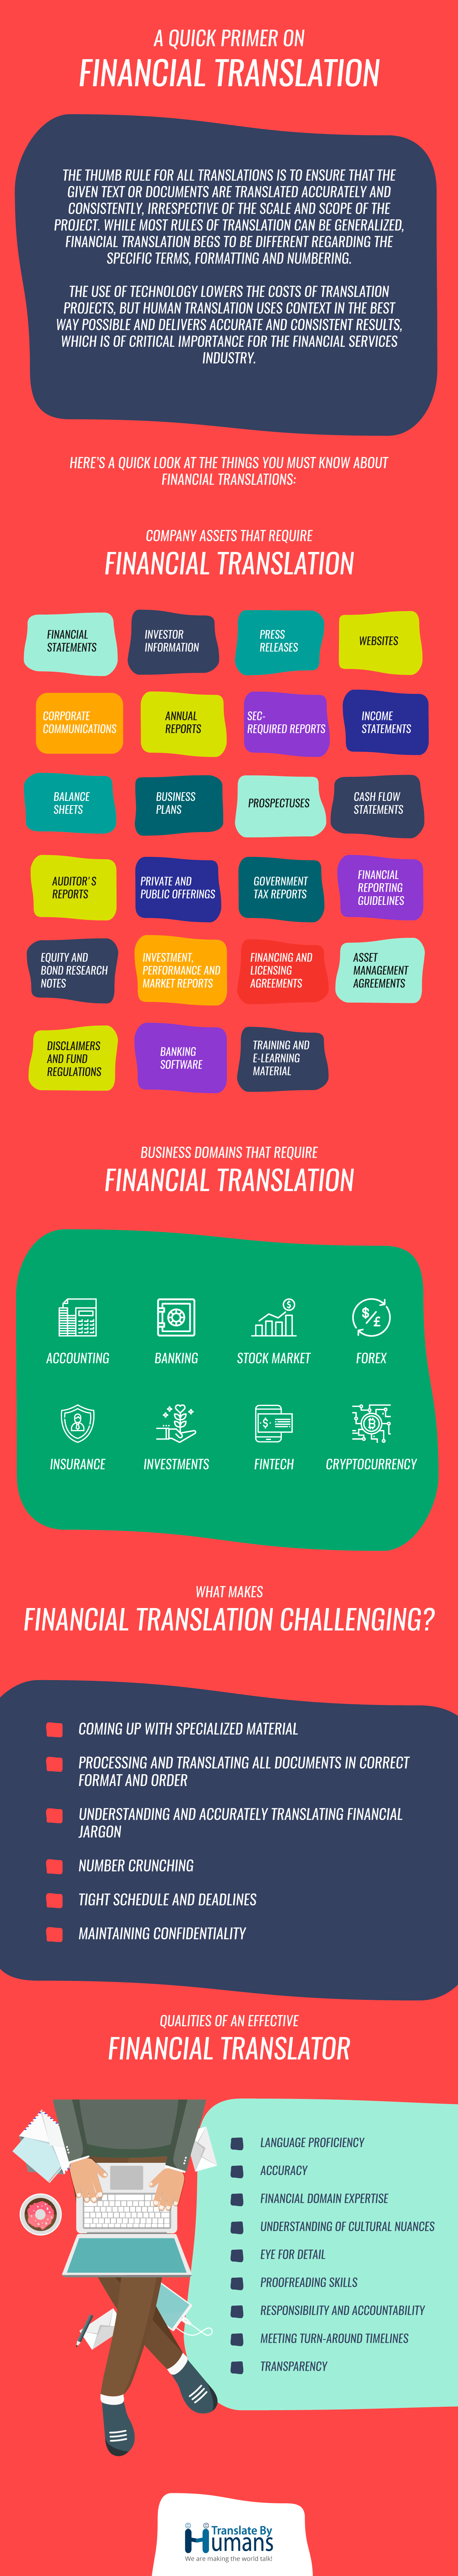 Financial Translation Infographic